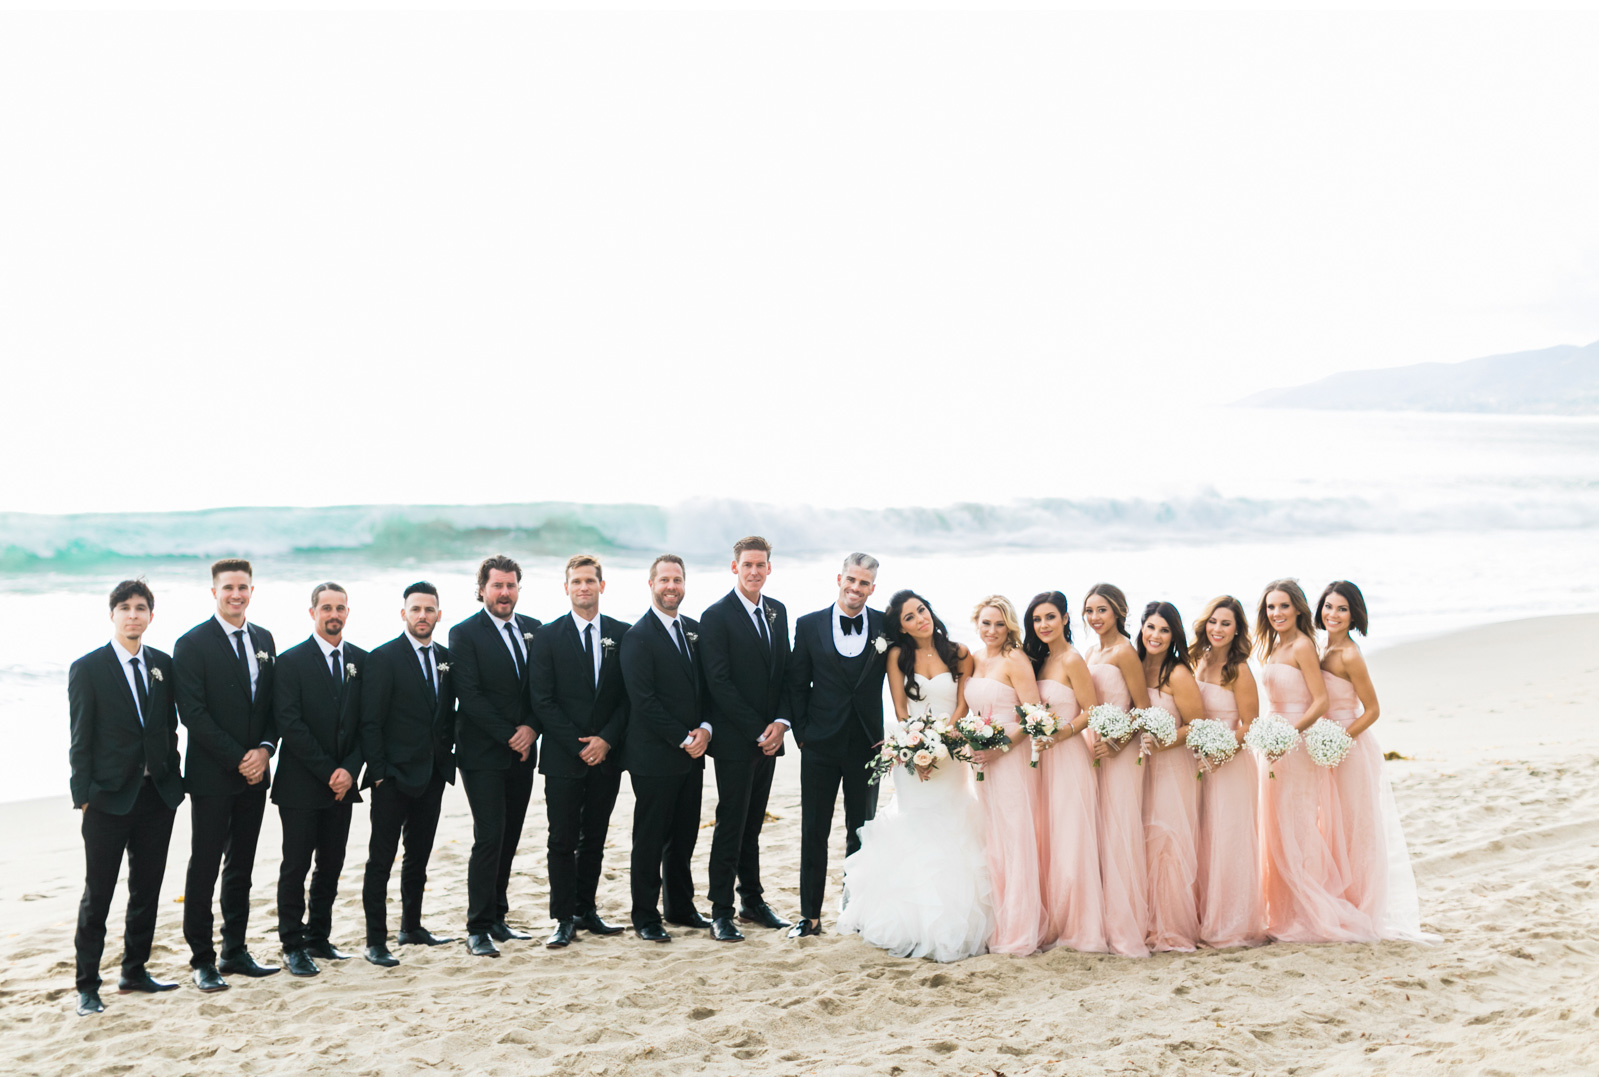 Rod-and-Lorin-Brewster-Style-Me-Pretty-Malibu-Beach-Wedding-Natalie-Schutt-Photography_19.jpg